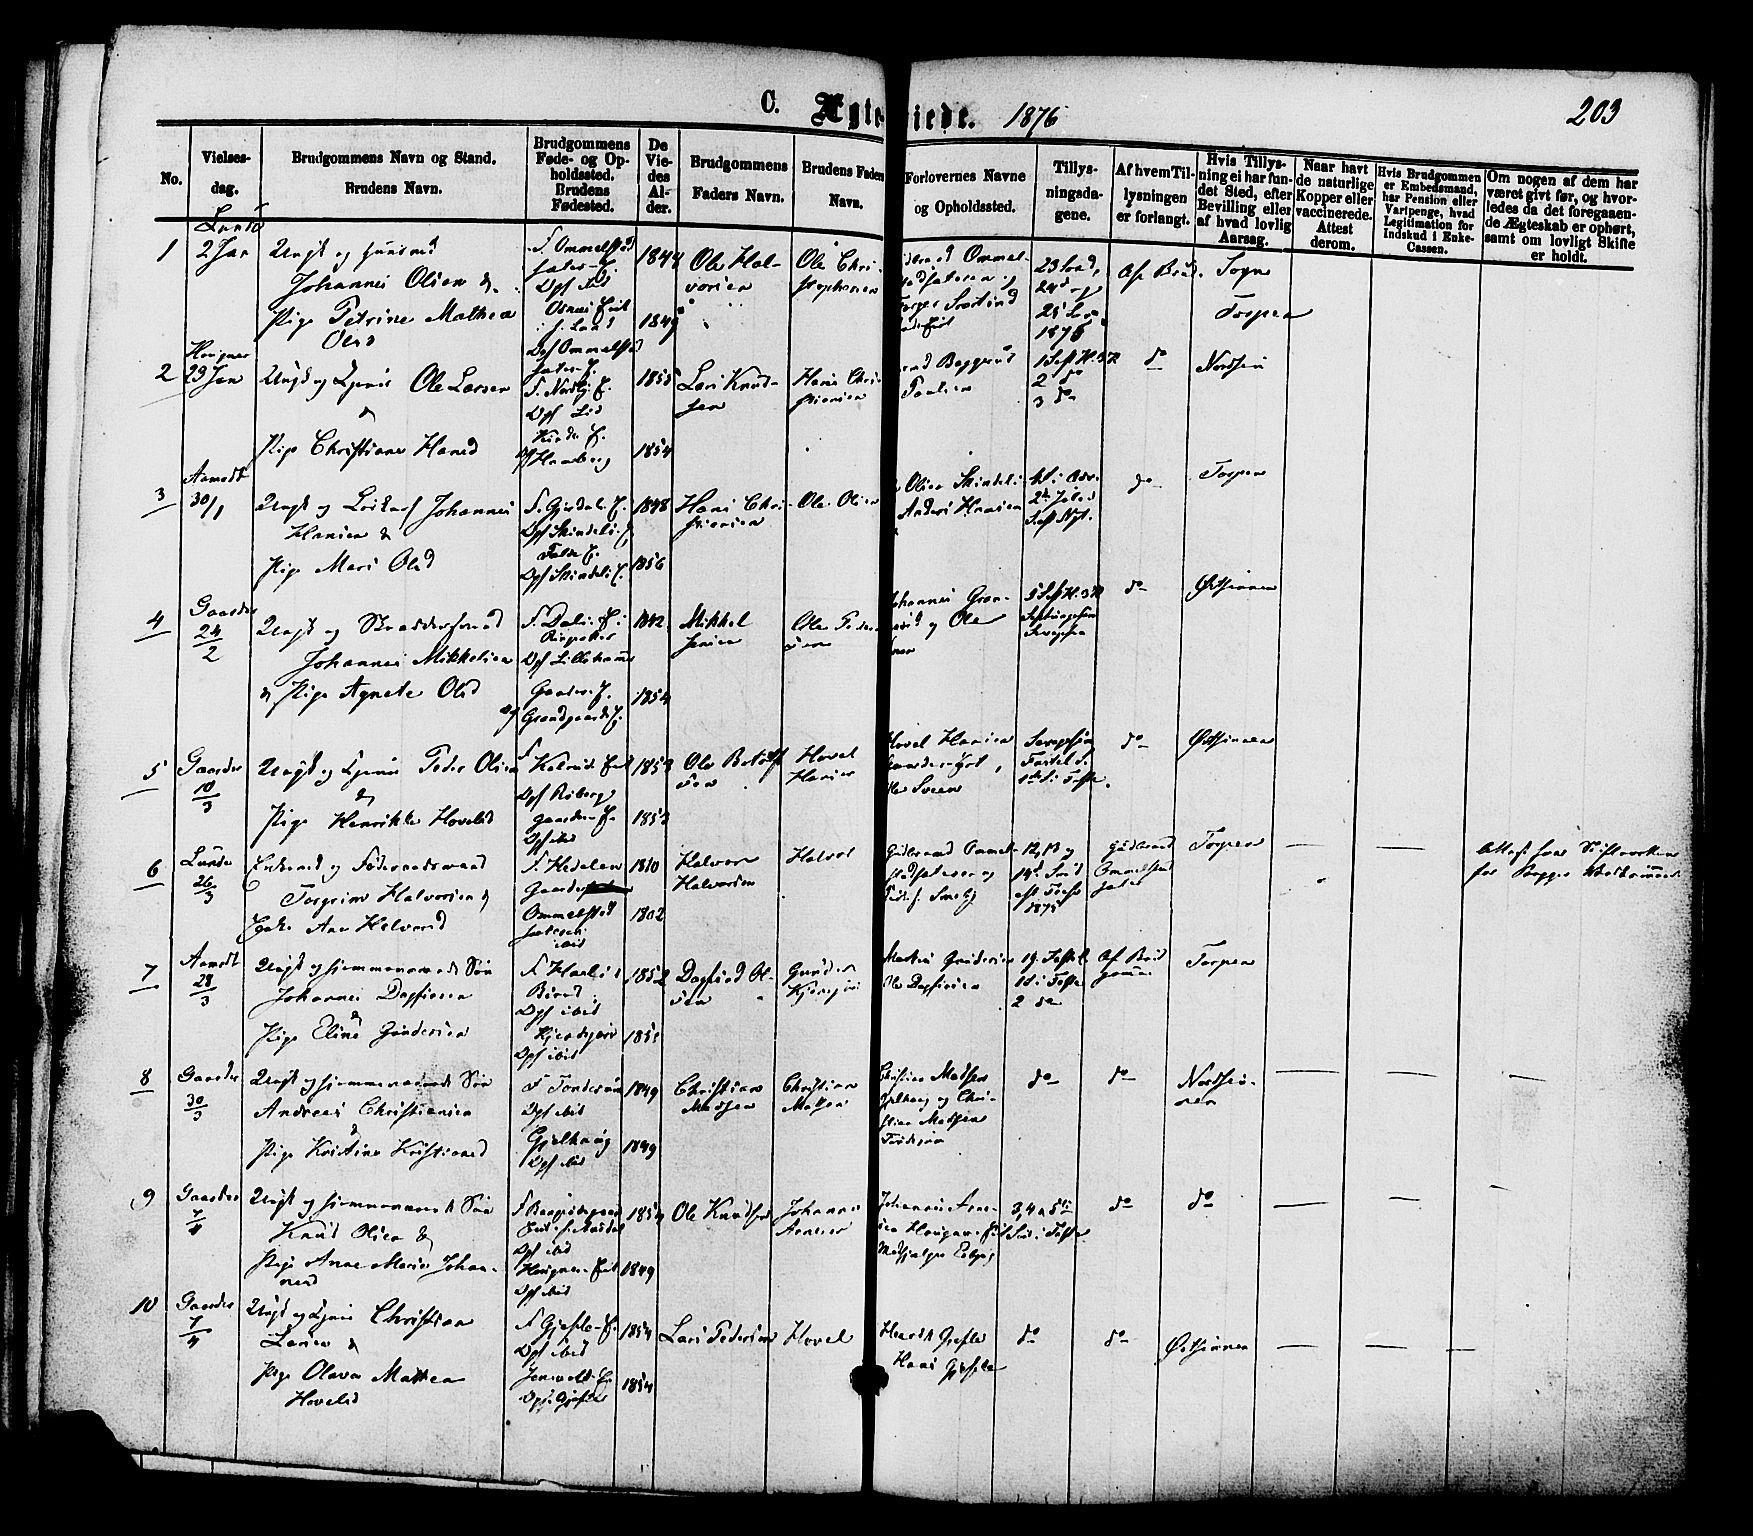 SAH, Nordre Land prestekontor, Ministerialbok nr. 2, 1872-1881, s. 203